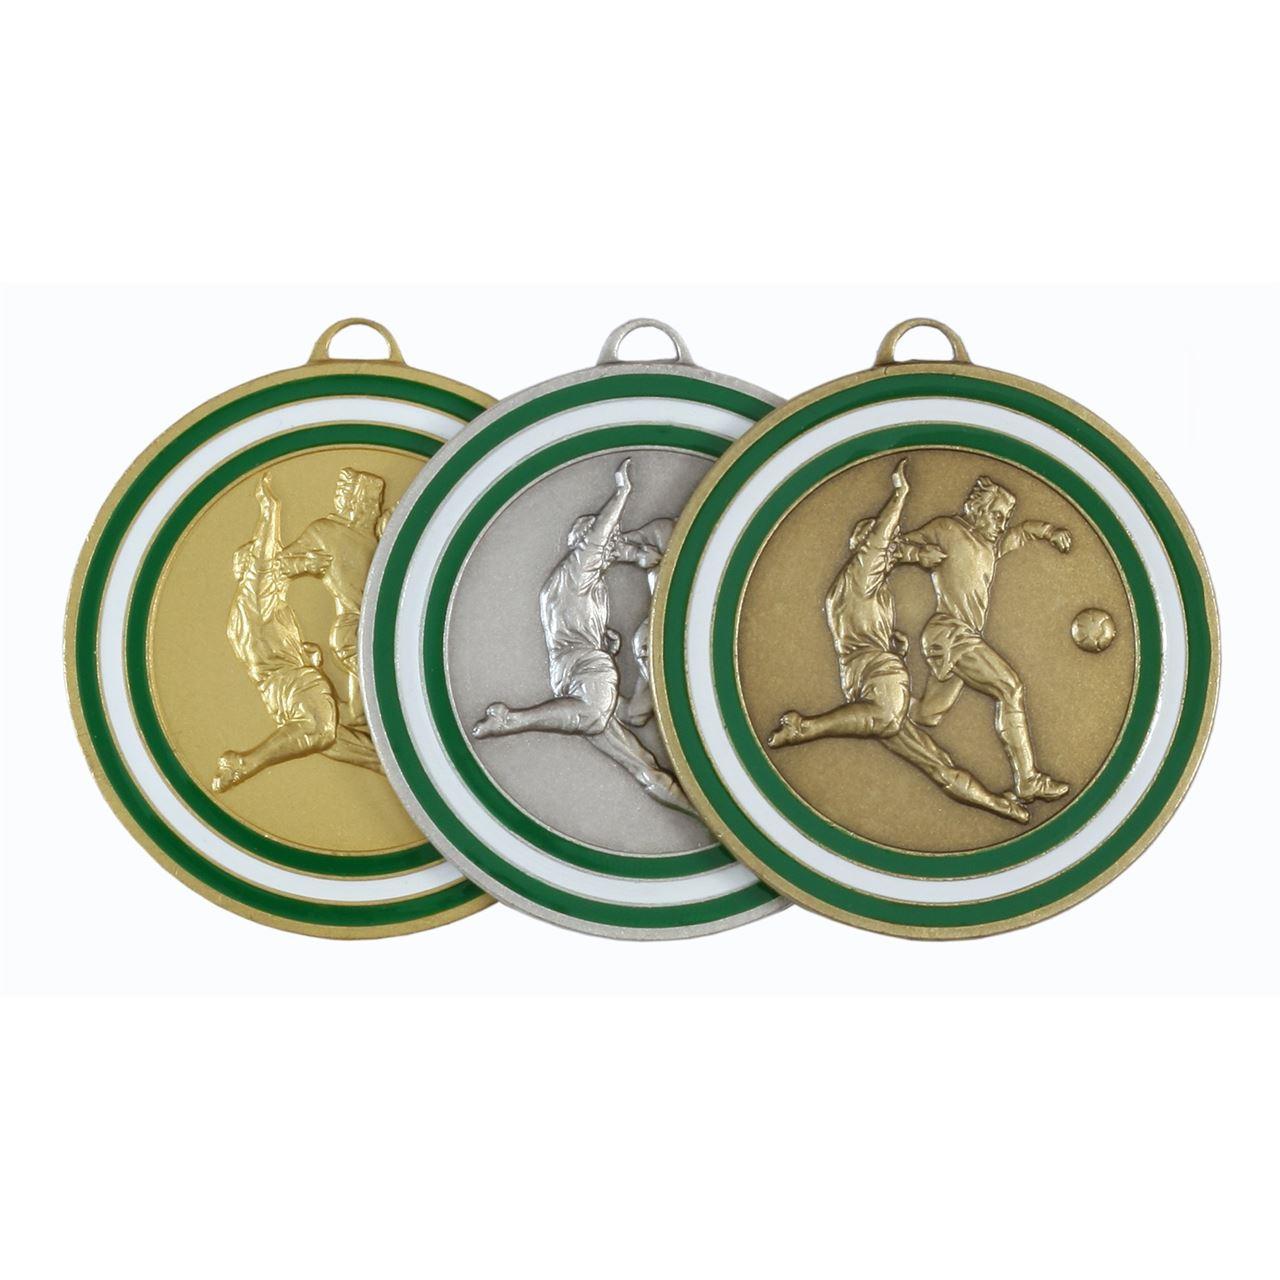 Green Coloured Enamel Football Medal (size: 50mm) - 175